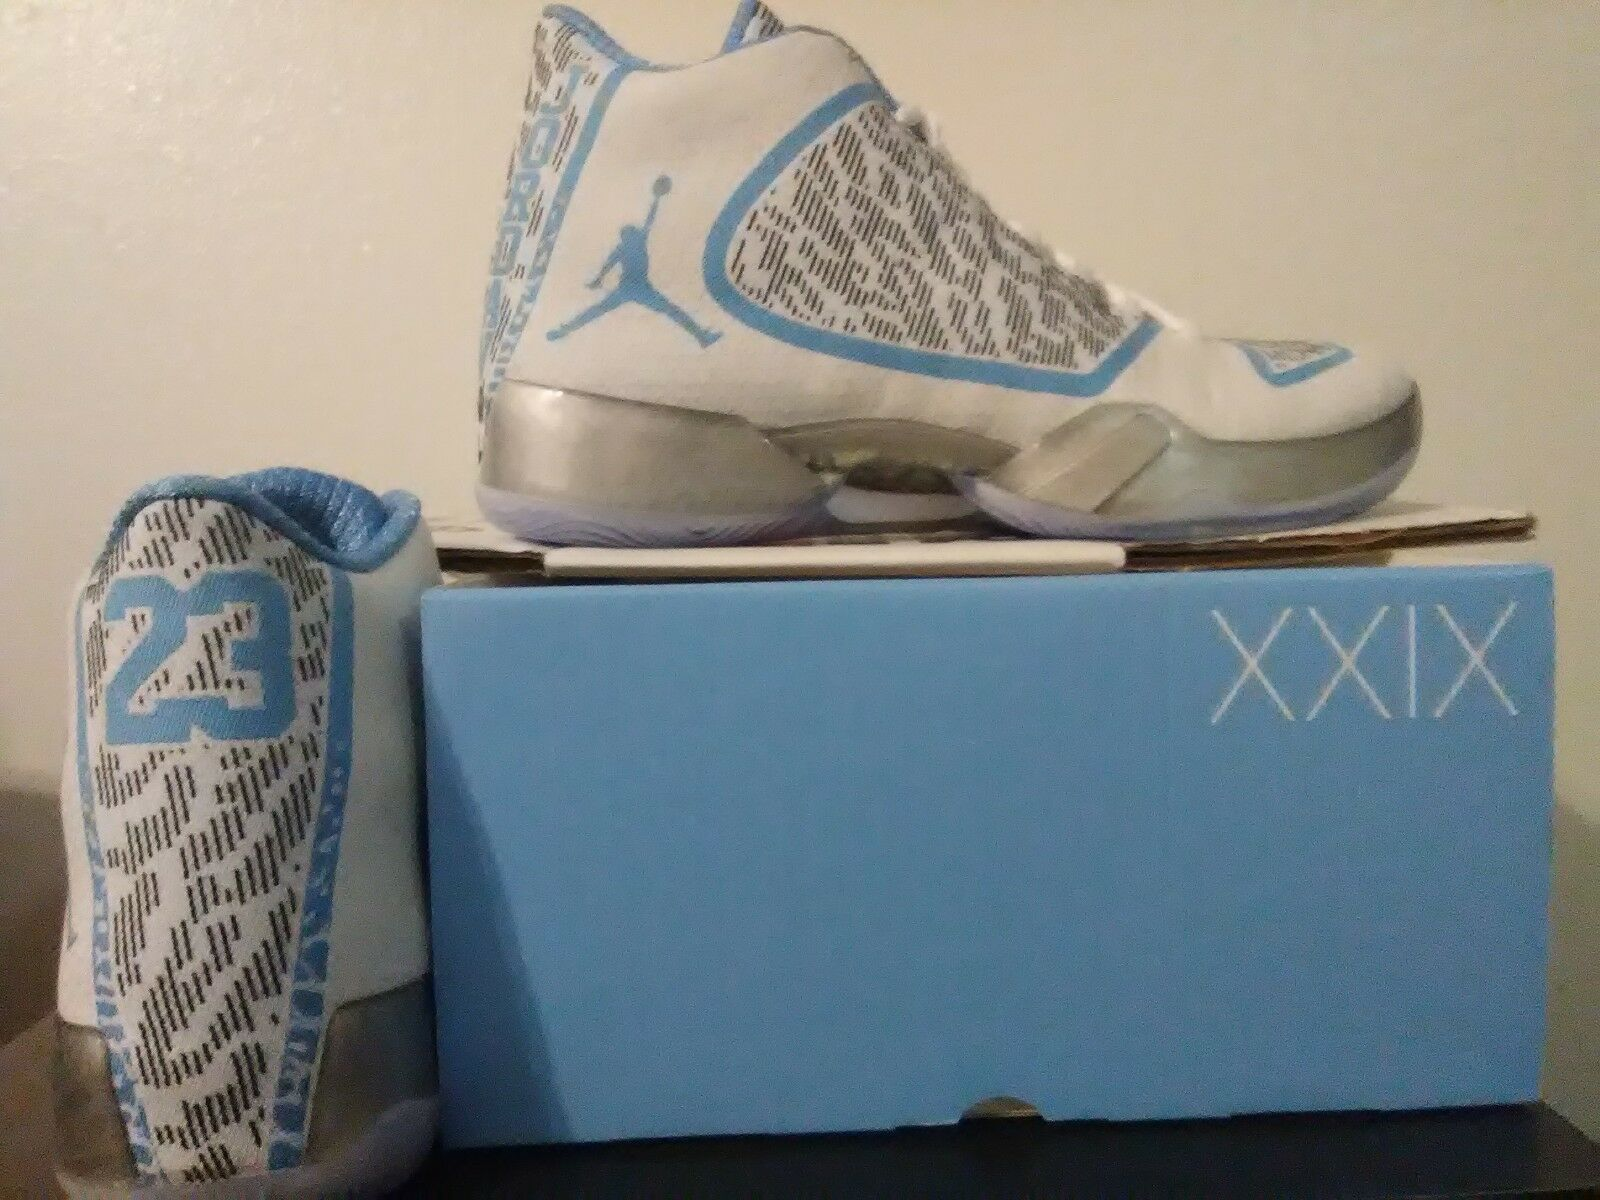 Air Jordan 29 White Silver Pantone Nike AJ XXIX Mens Shoes 717796-108 Comfortable Comfortable and good-looking